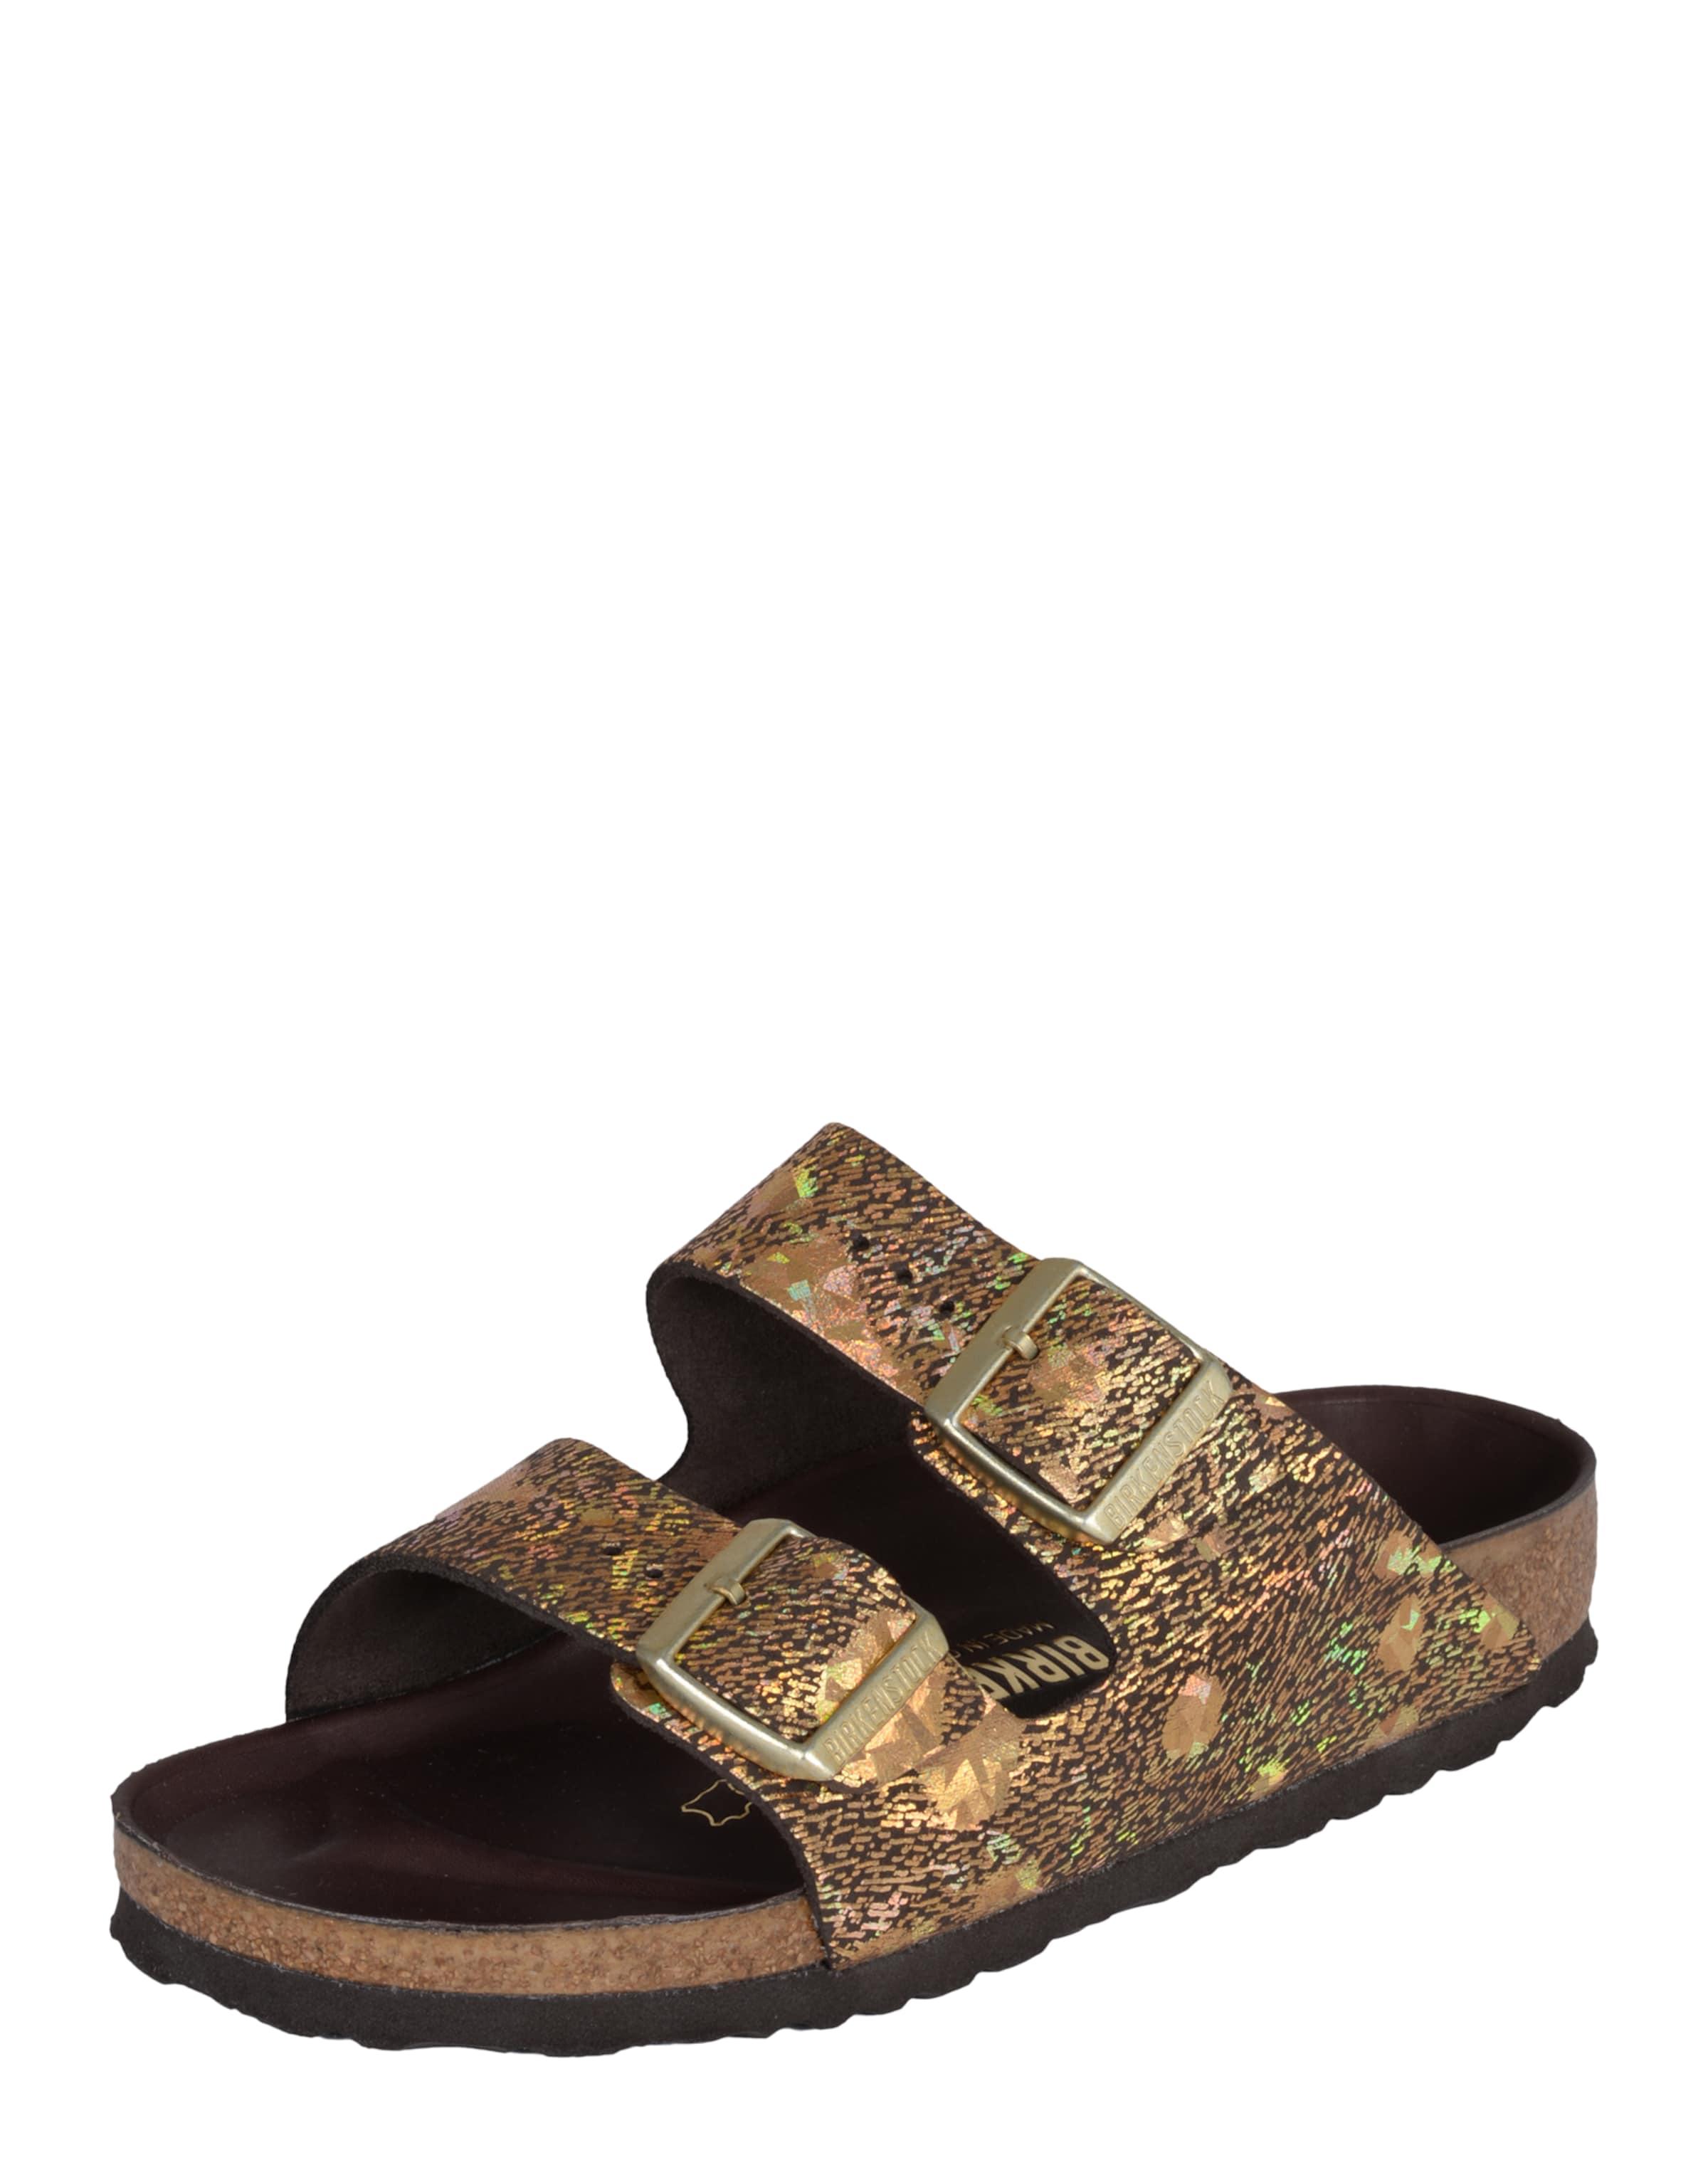 BIRKENSTOCK Sandale Arizona Hex Verschleißfeste billige Schuhe